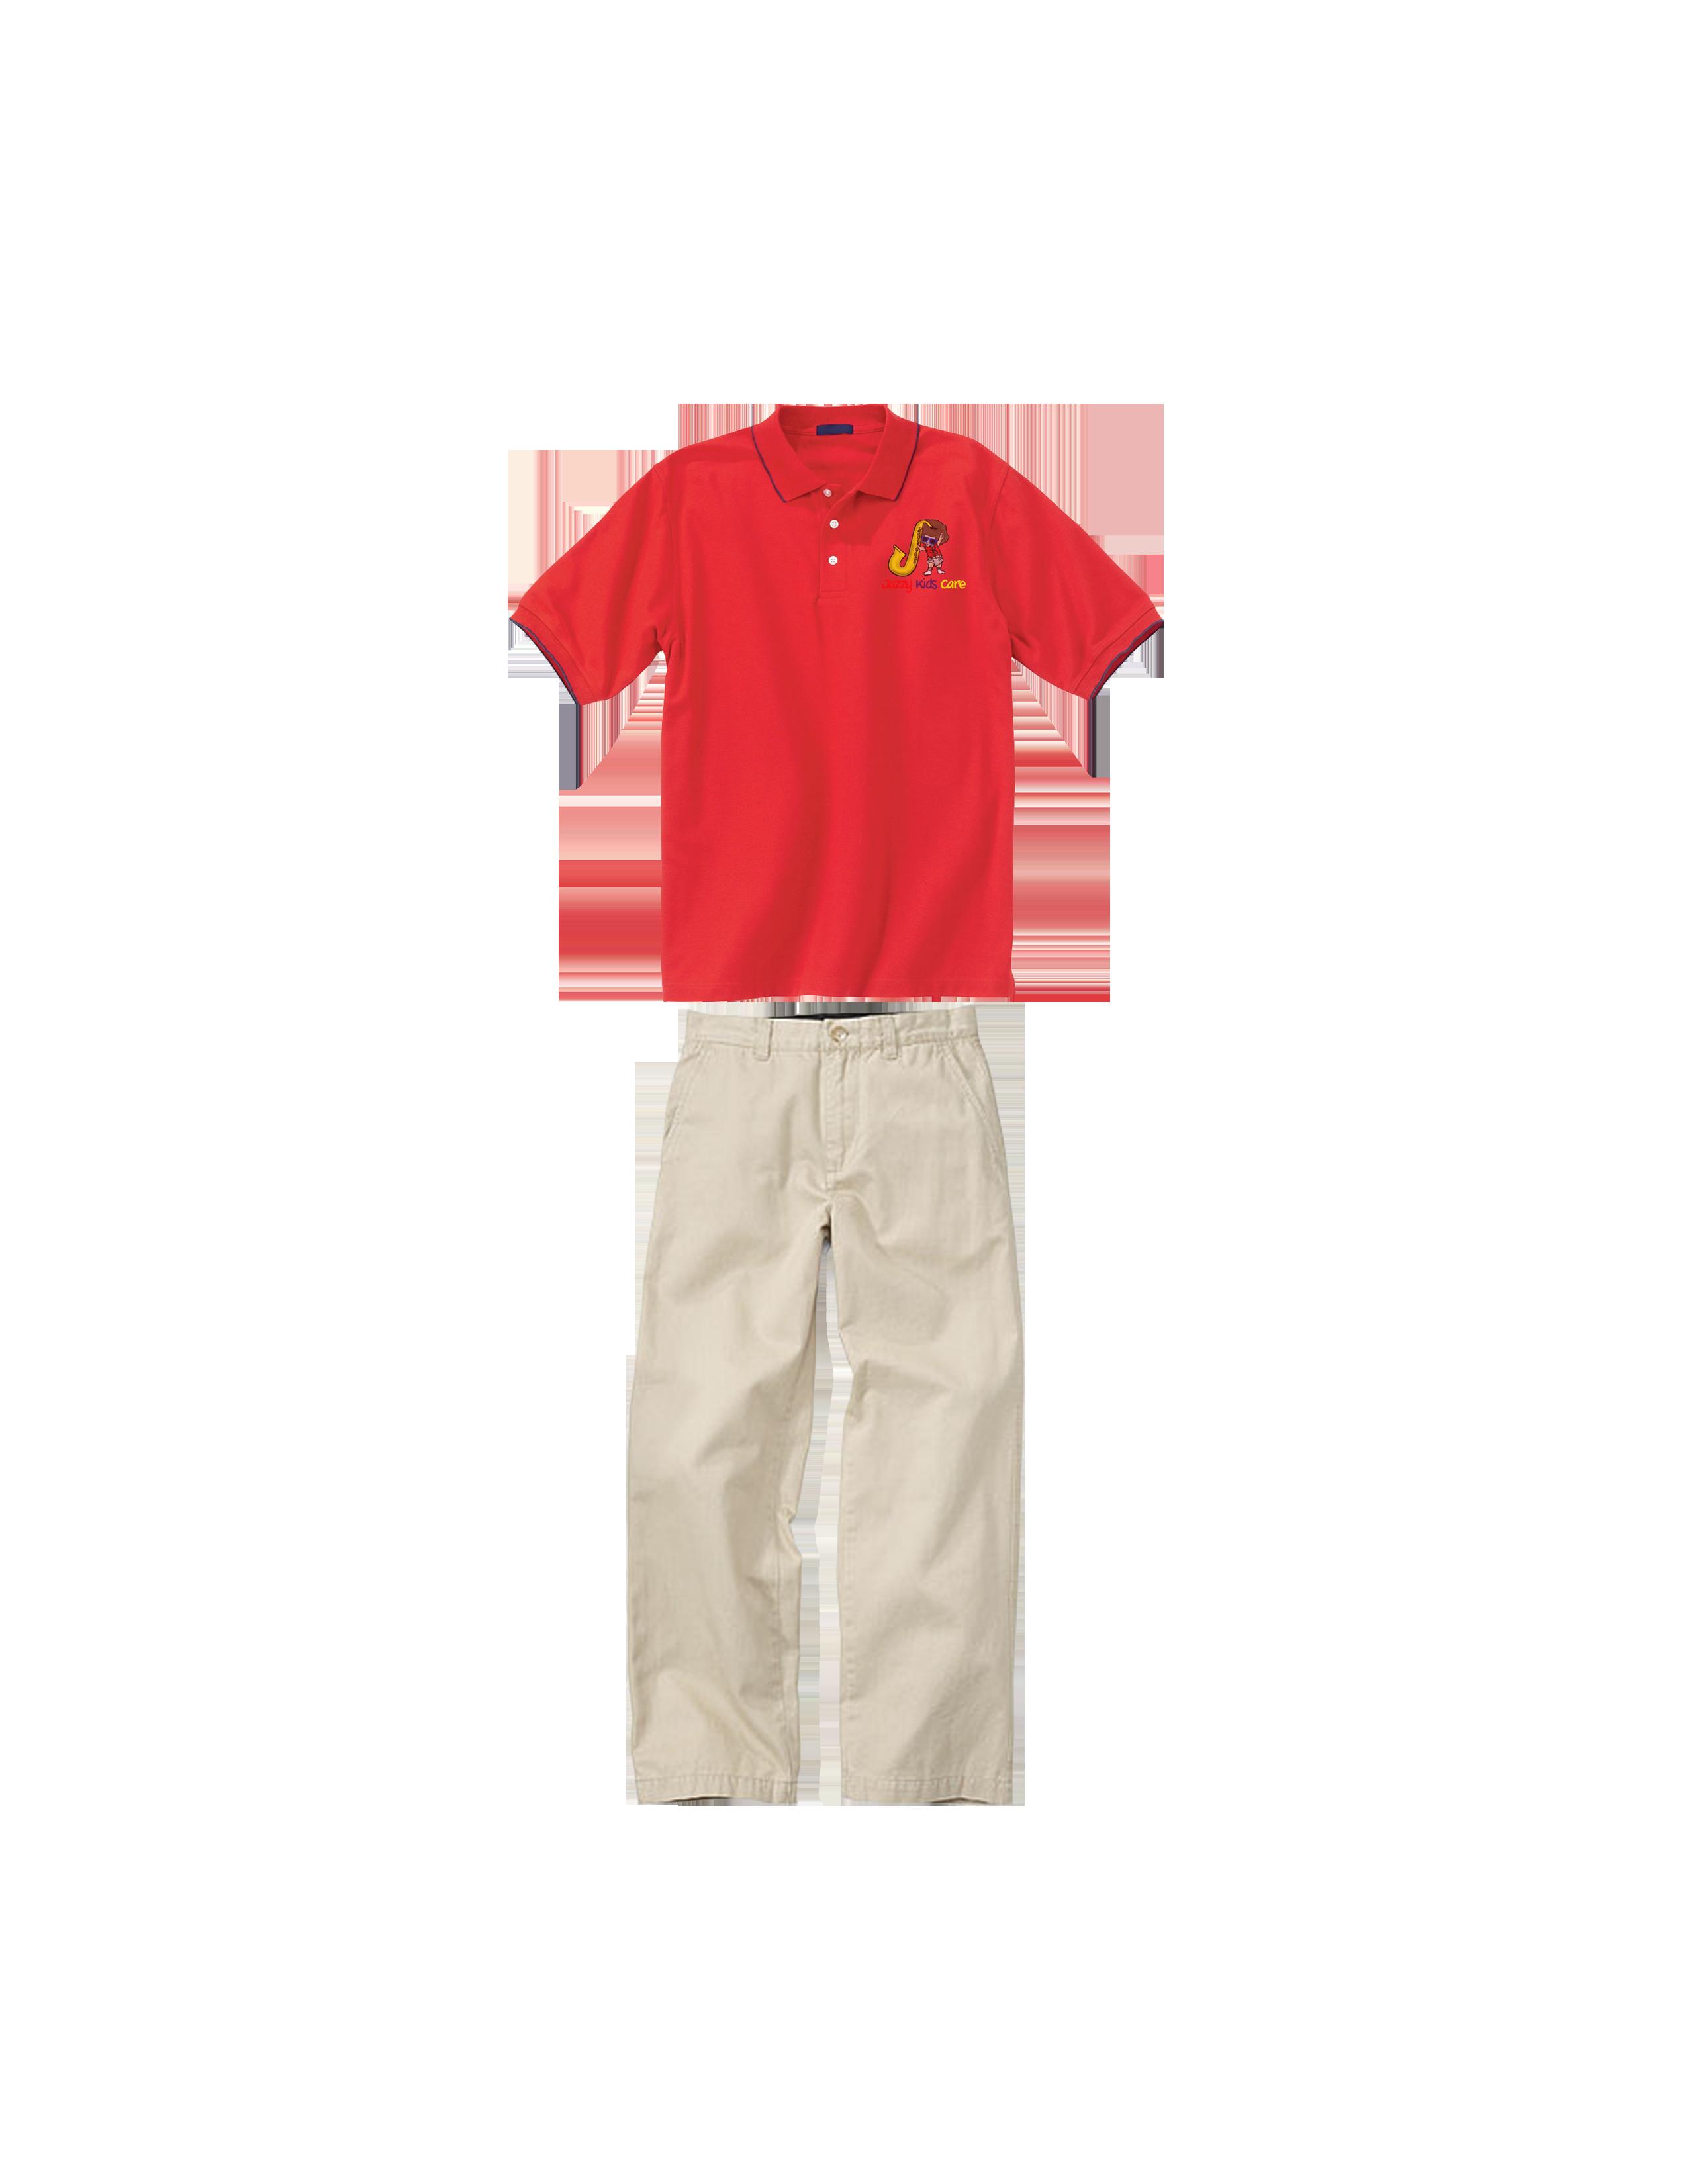 Kids clipart pants. Jazzy care uniform girlsshirtpants